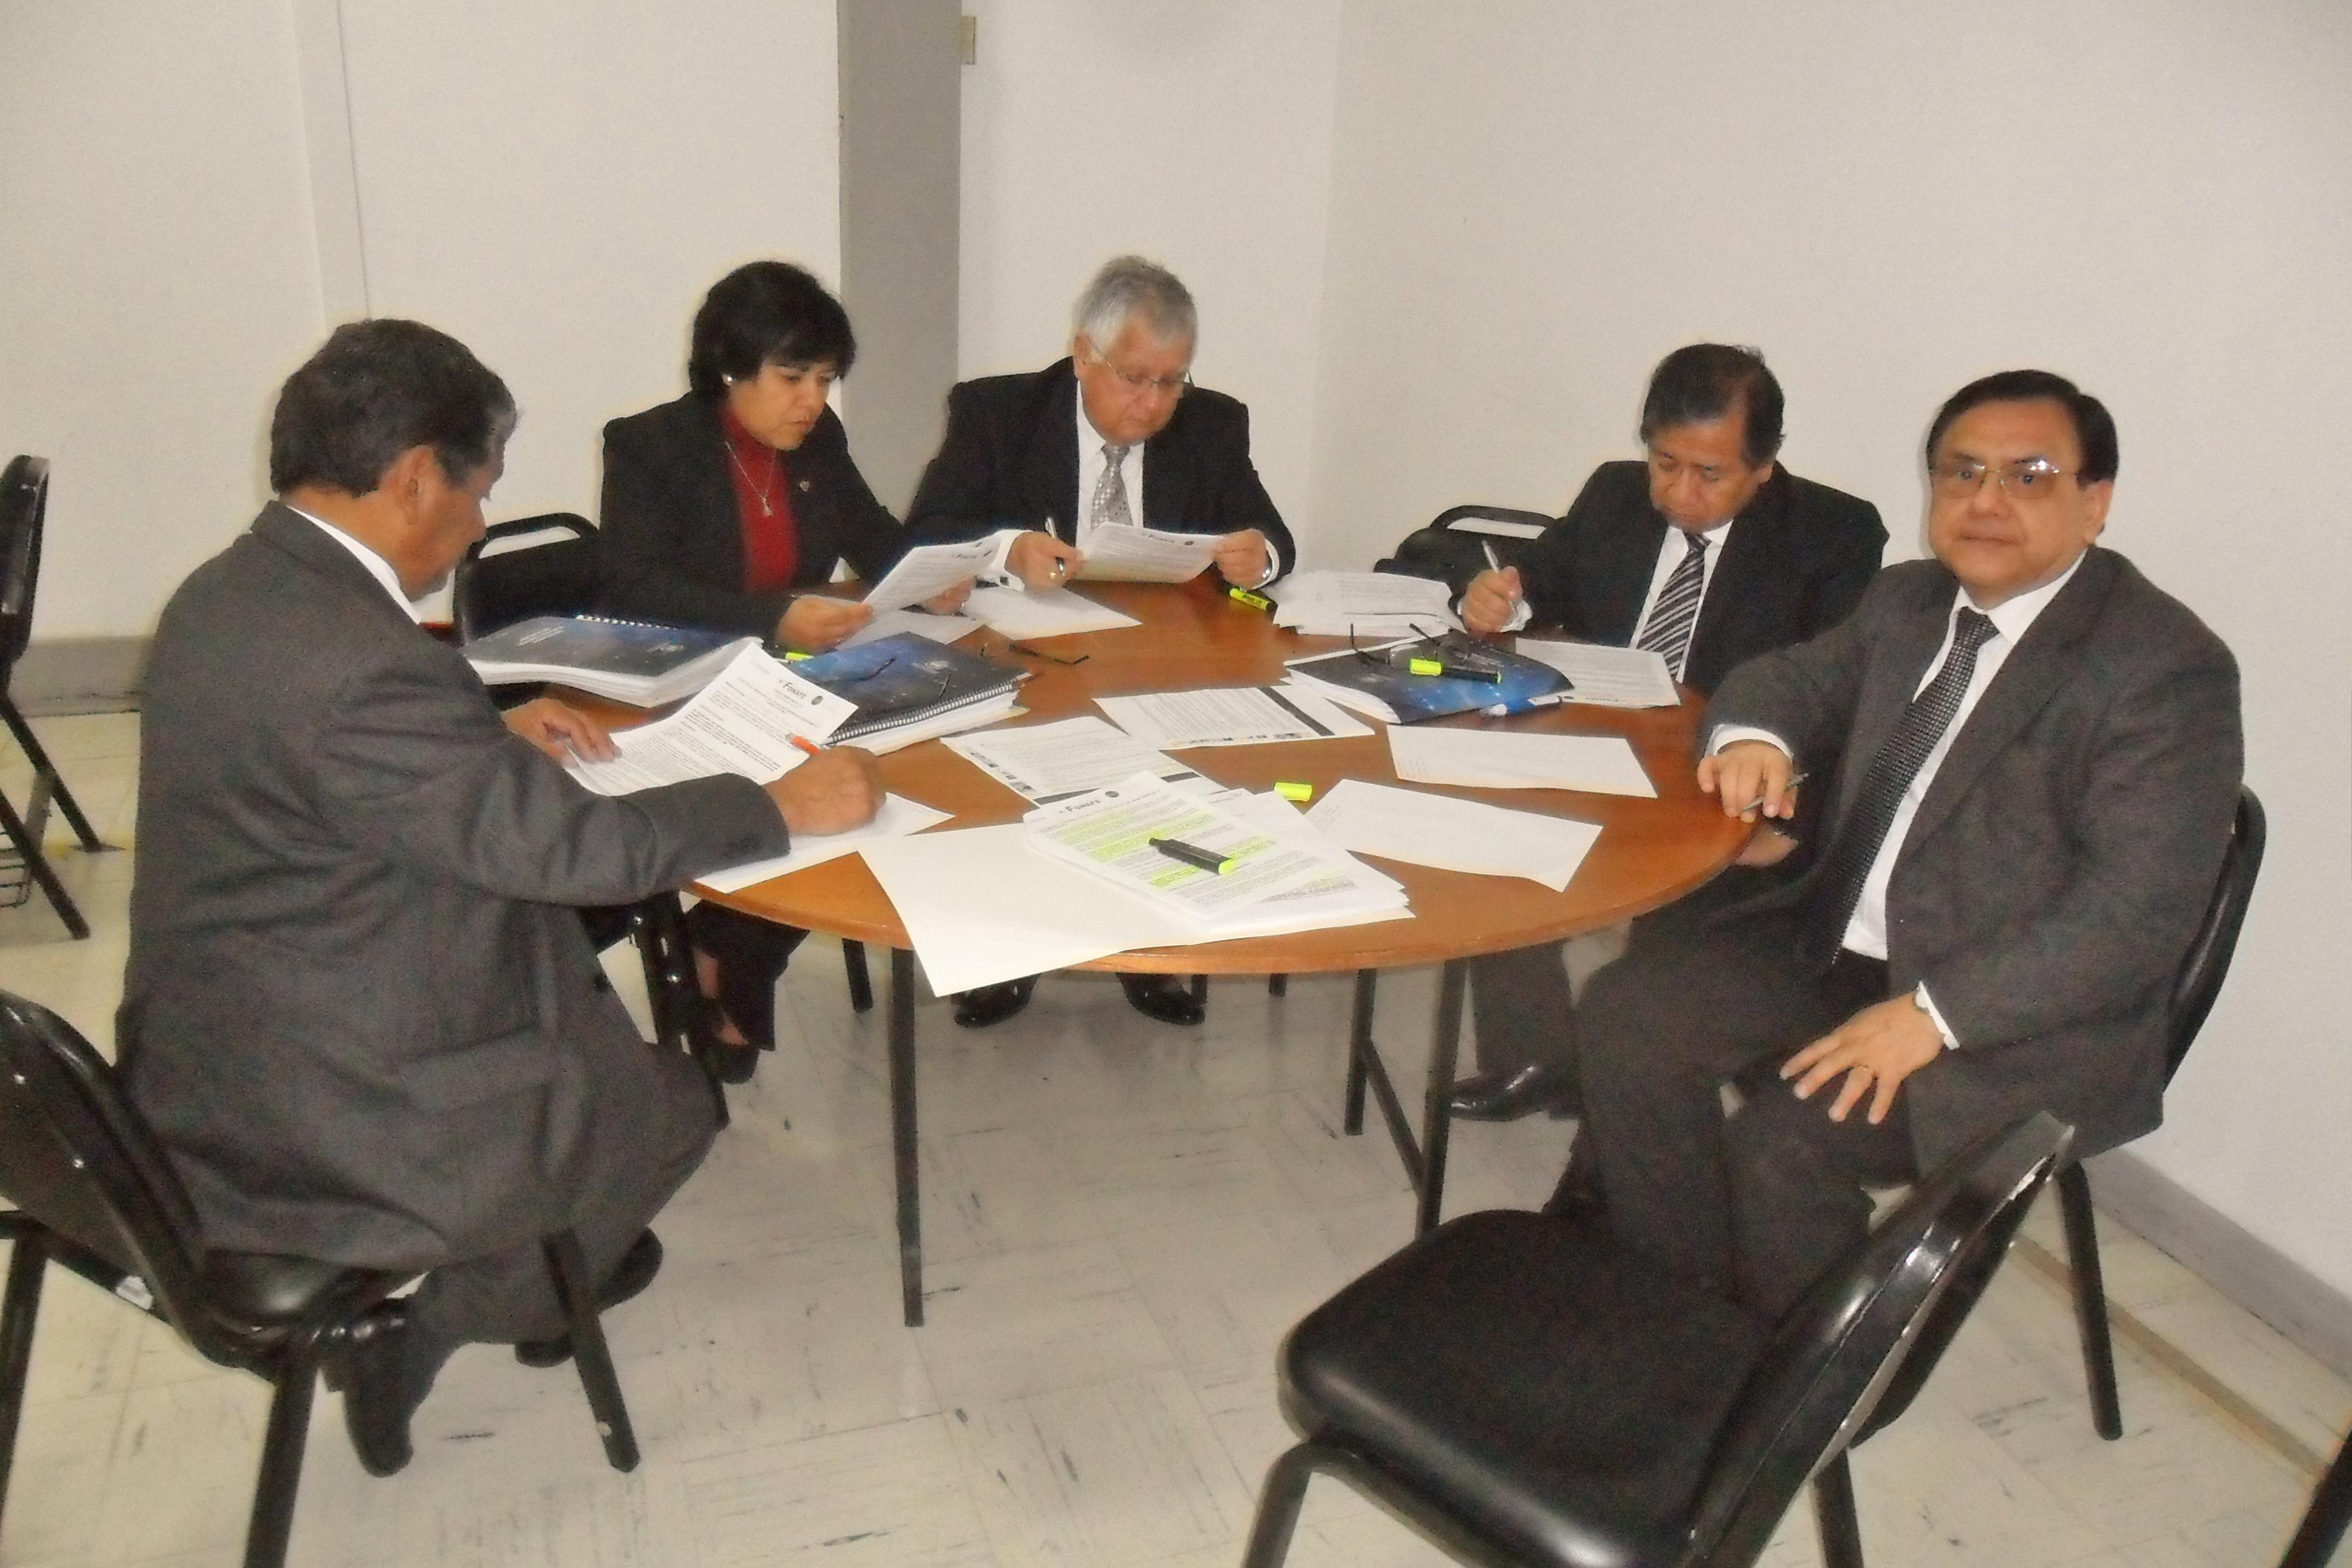 Exposicion grupal - Grupo IDD